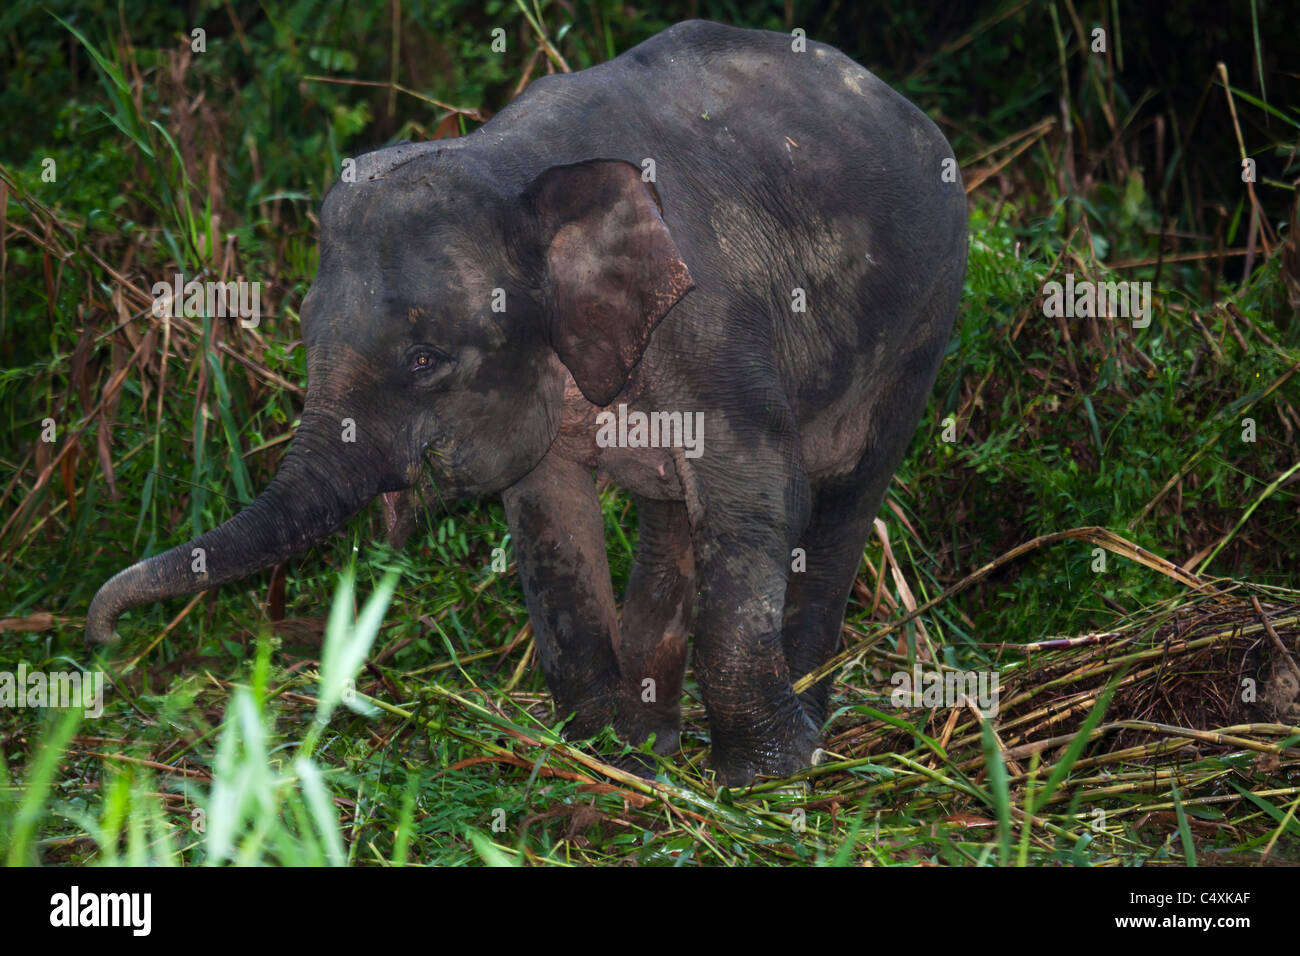 Wild Asian elephant Borneo pygmy elephants grazing in riverine marshland - Stock Image